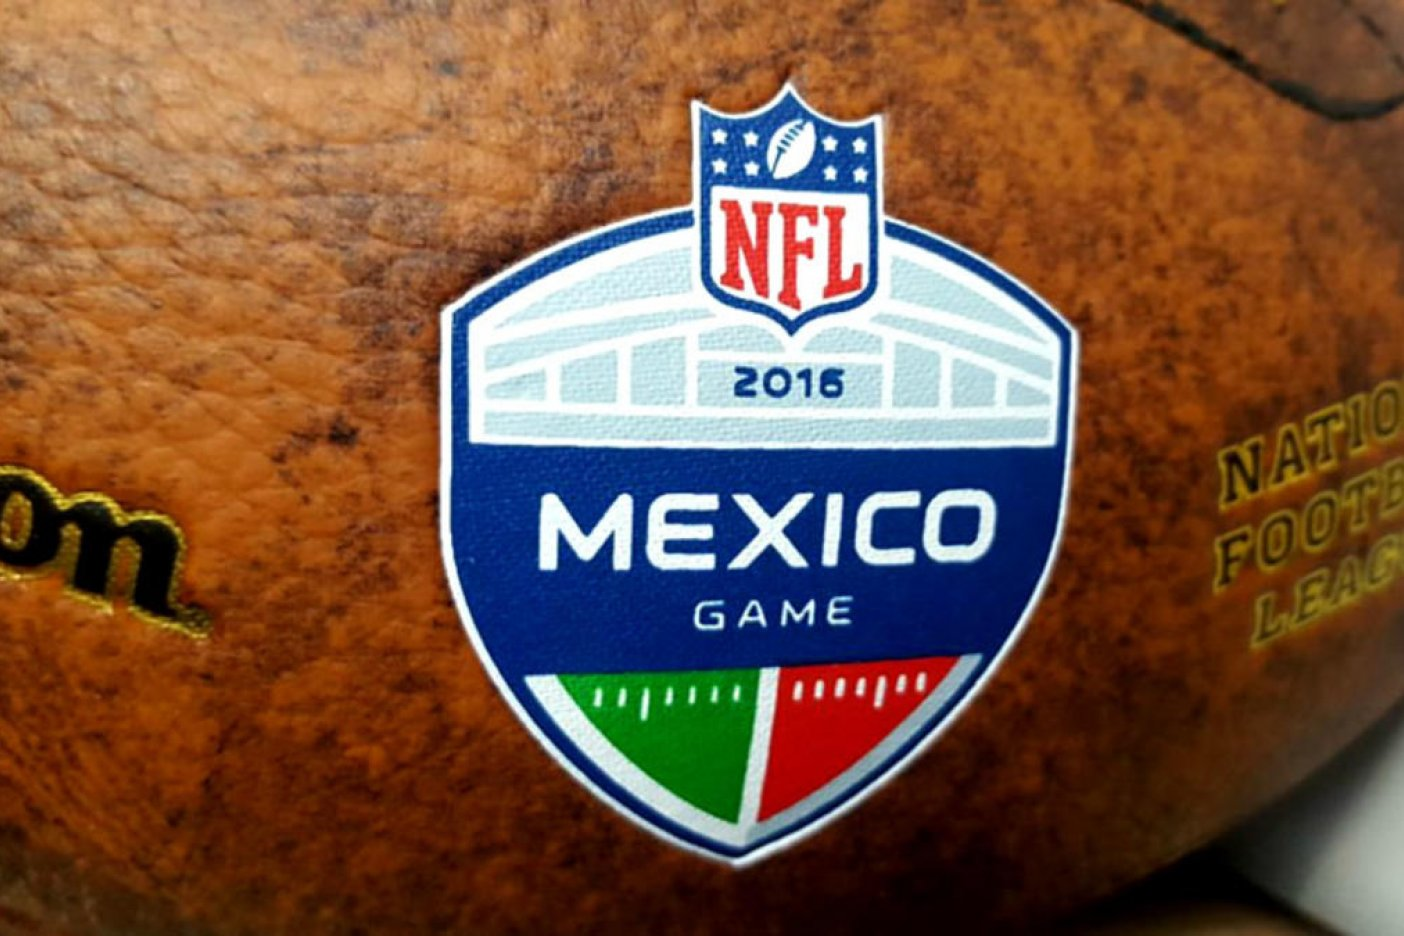 NFL México pide perdón por desafortunado tuit tras sismo